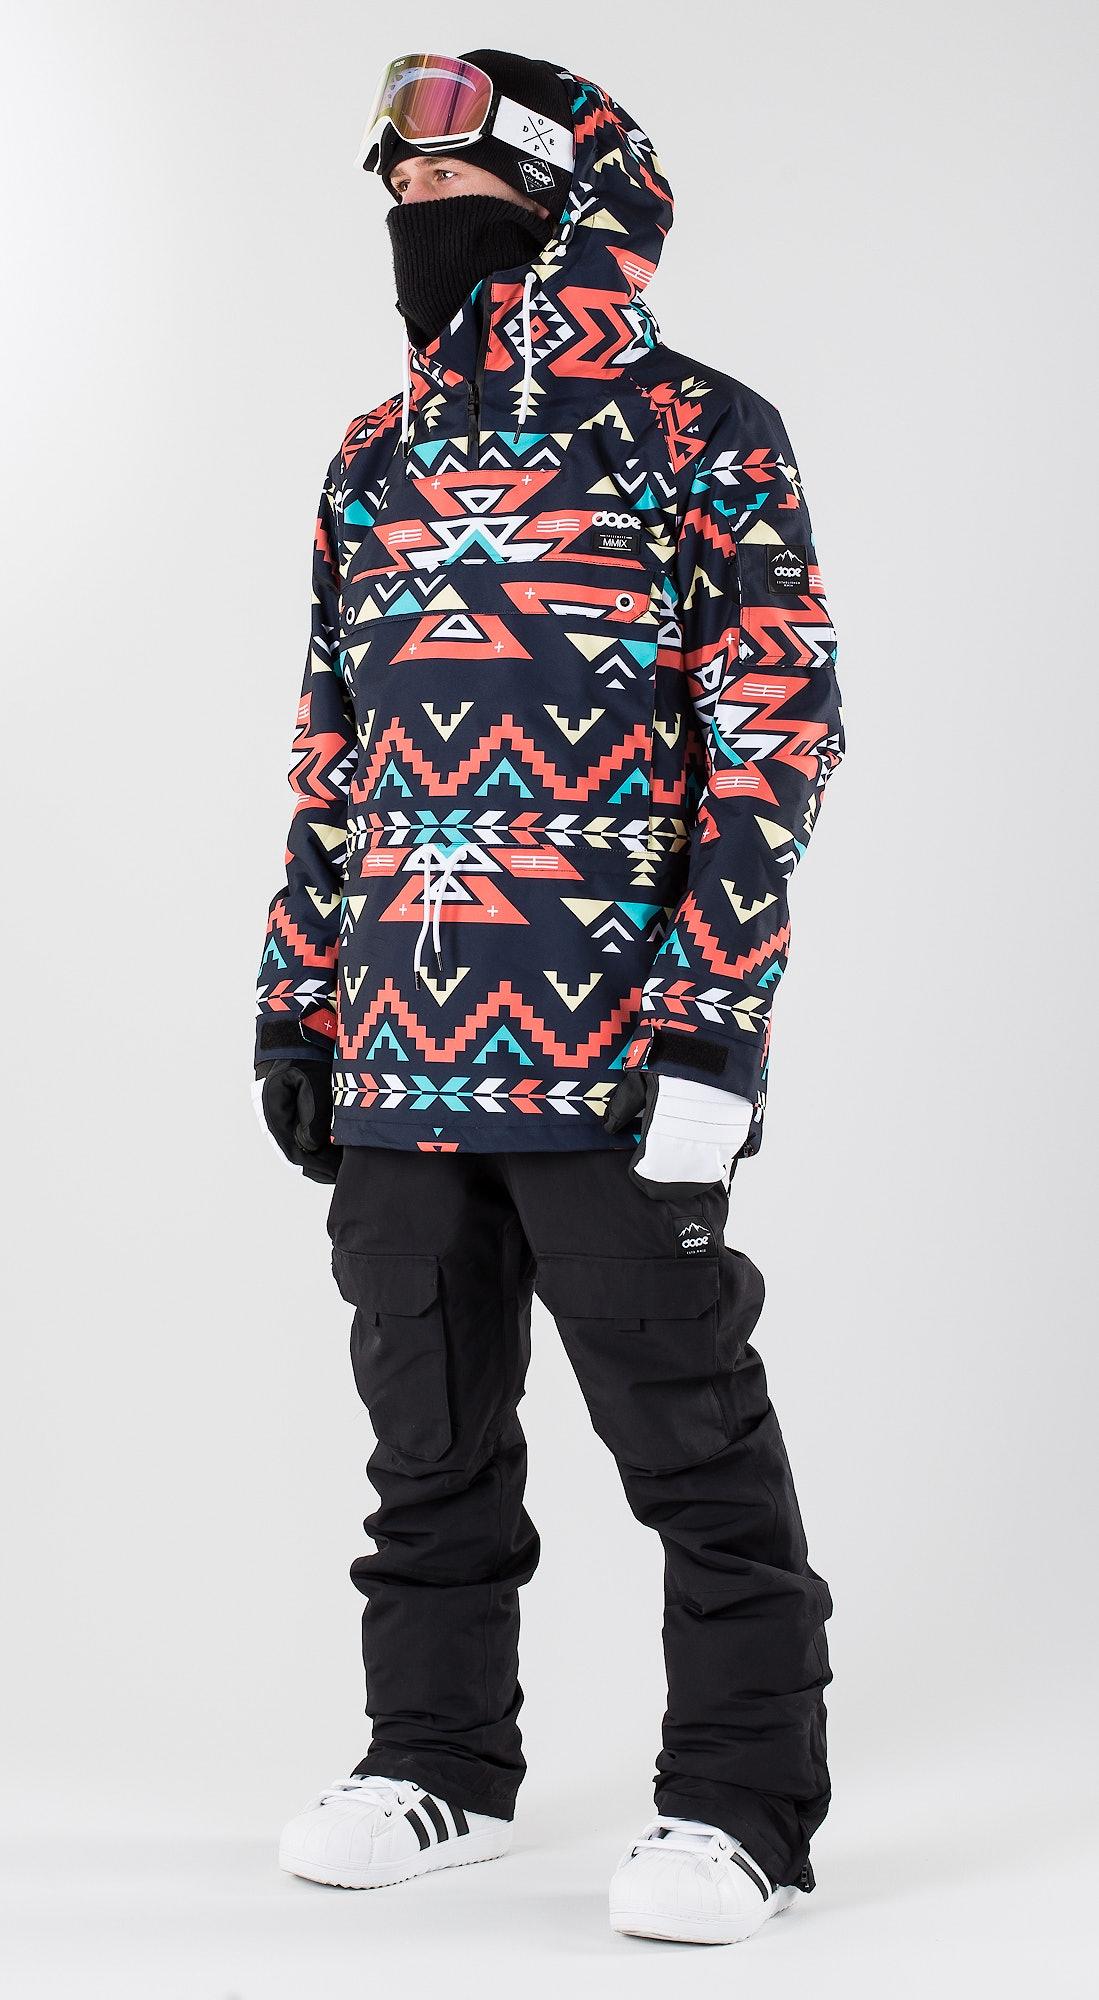 5be988da Snowboardklær fra Adidas, Dope & Burton - Fri frakt! - Ridestore.no